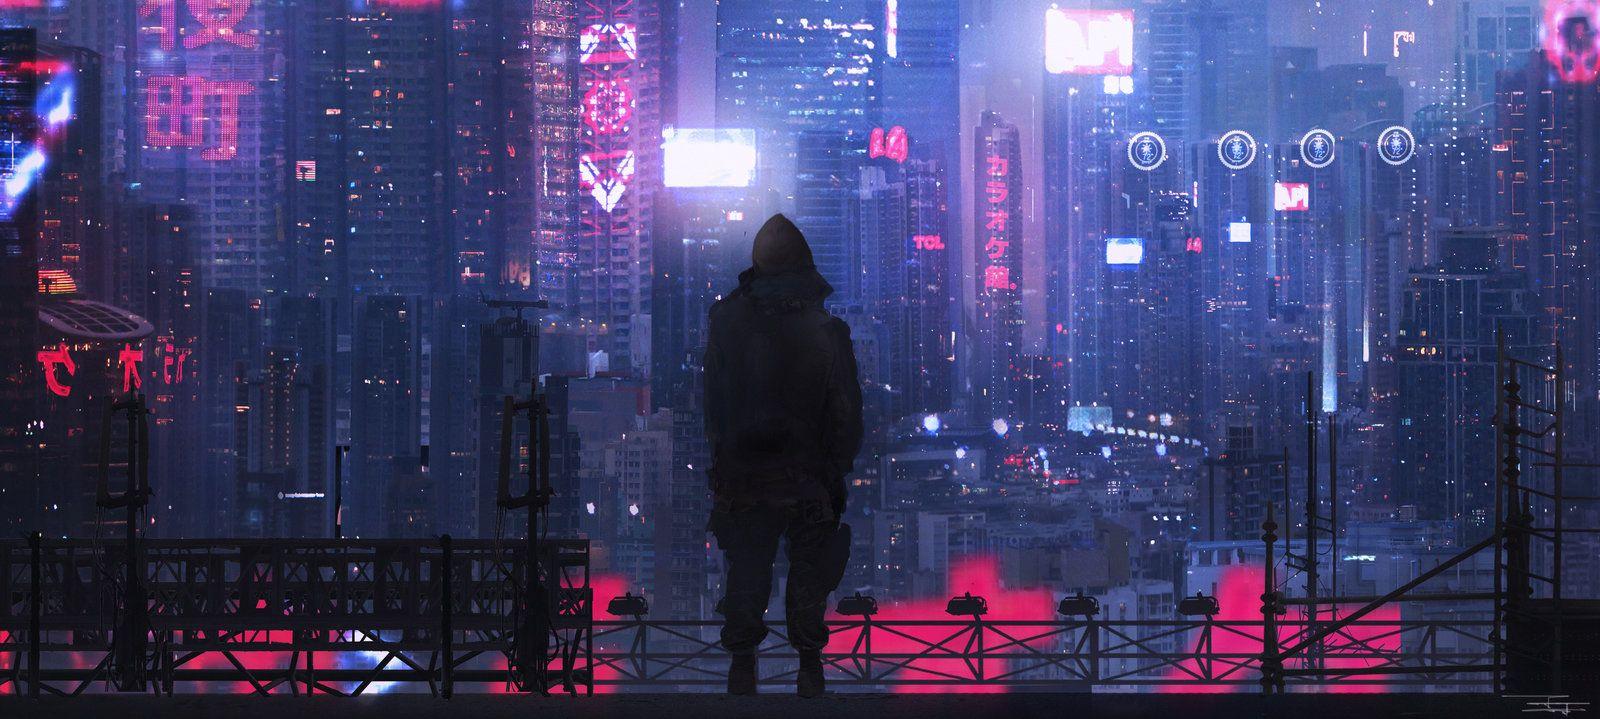 Image result for Cyberpunk | Futuristic city, Cyberpunk ...